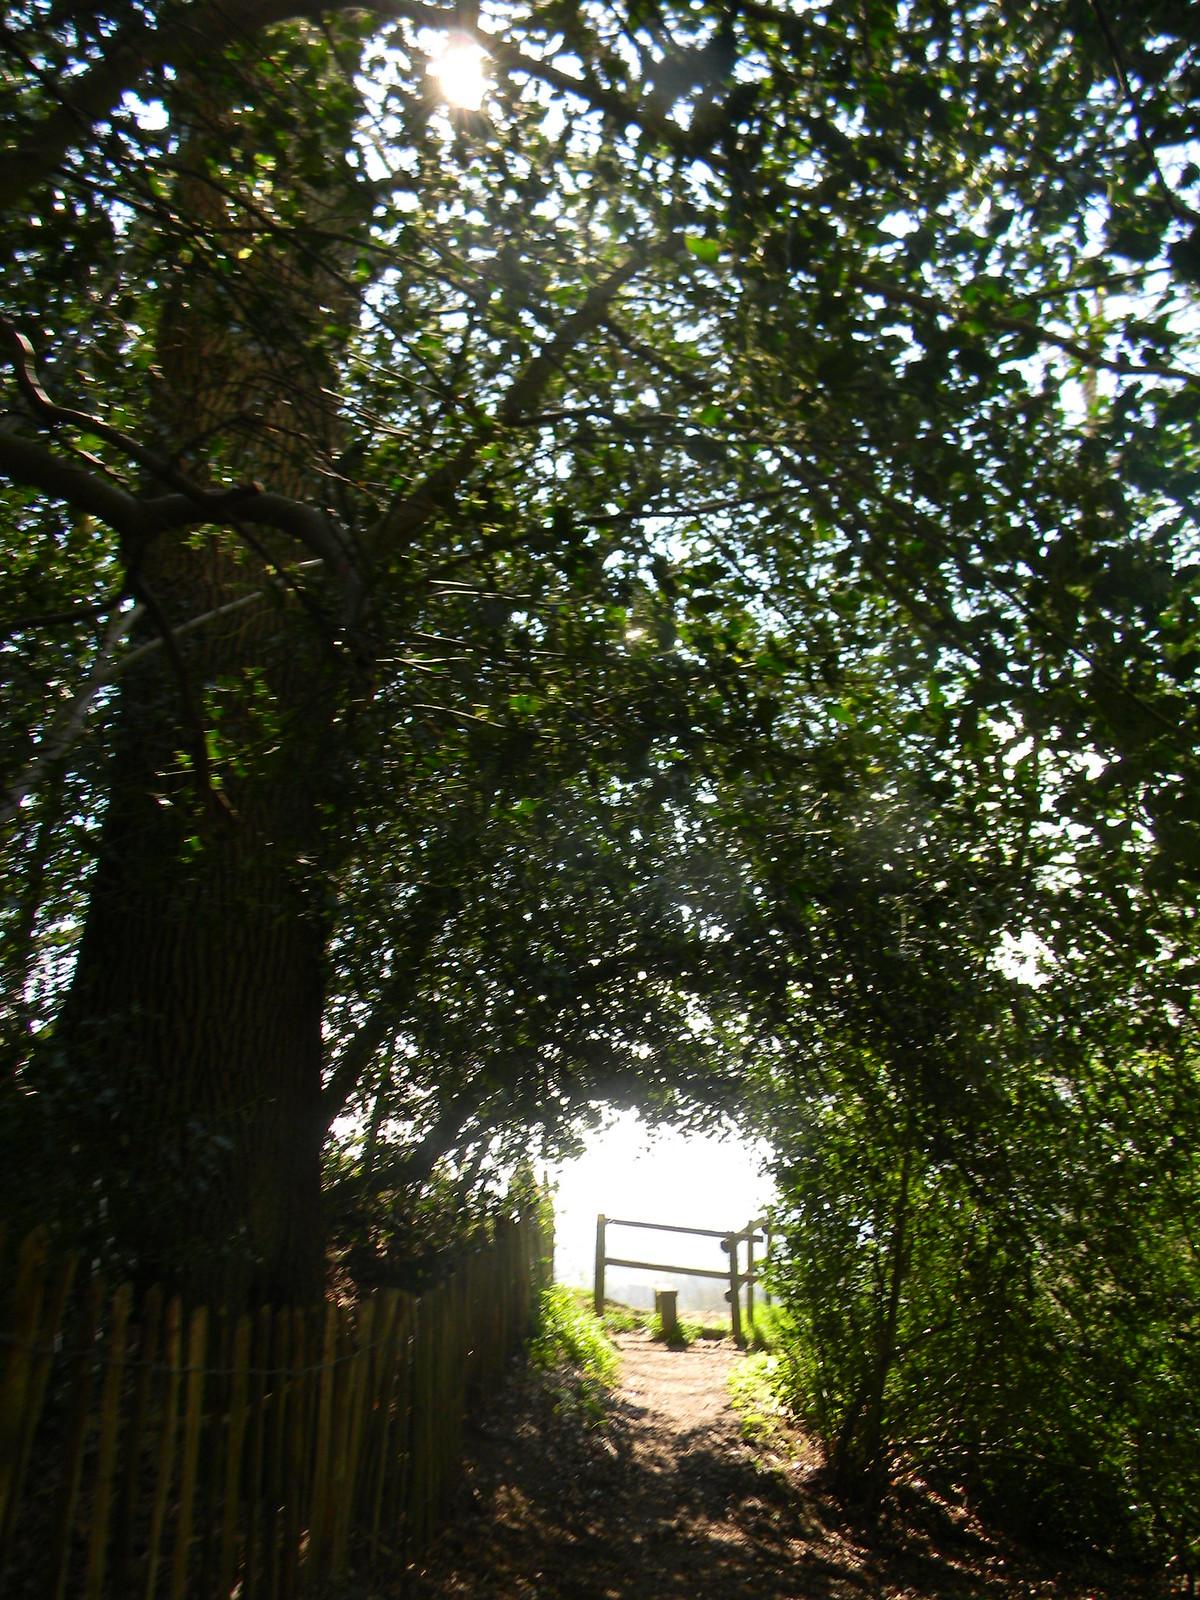 Stile approaching Hurst Green to Wetherham